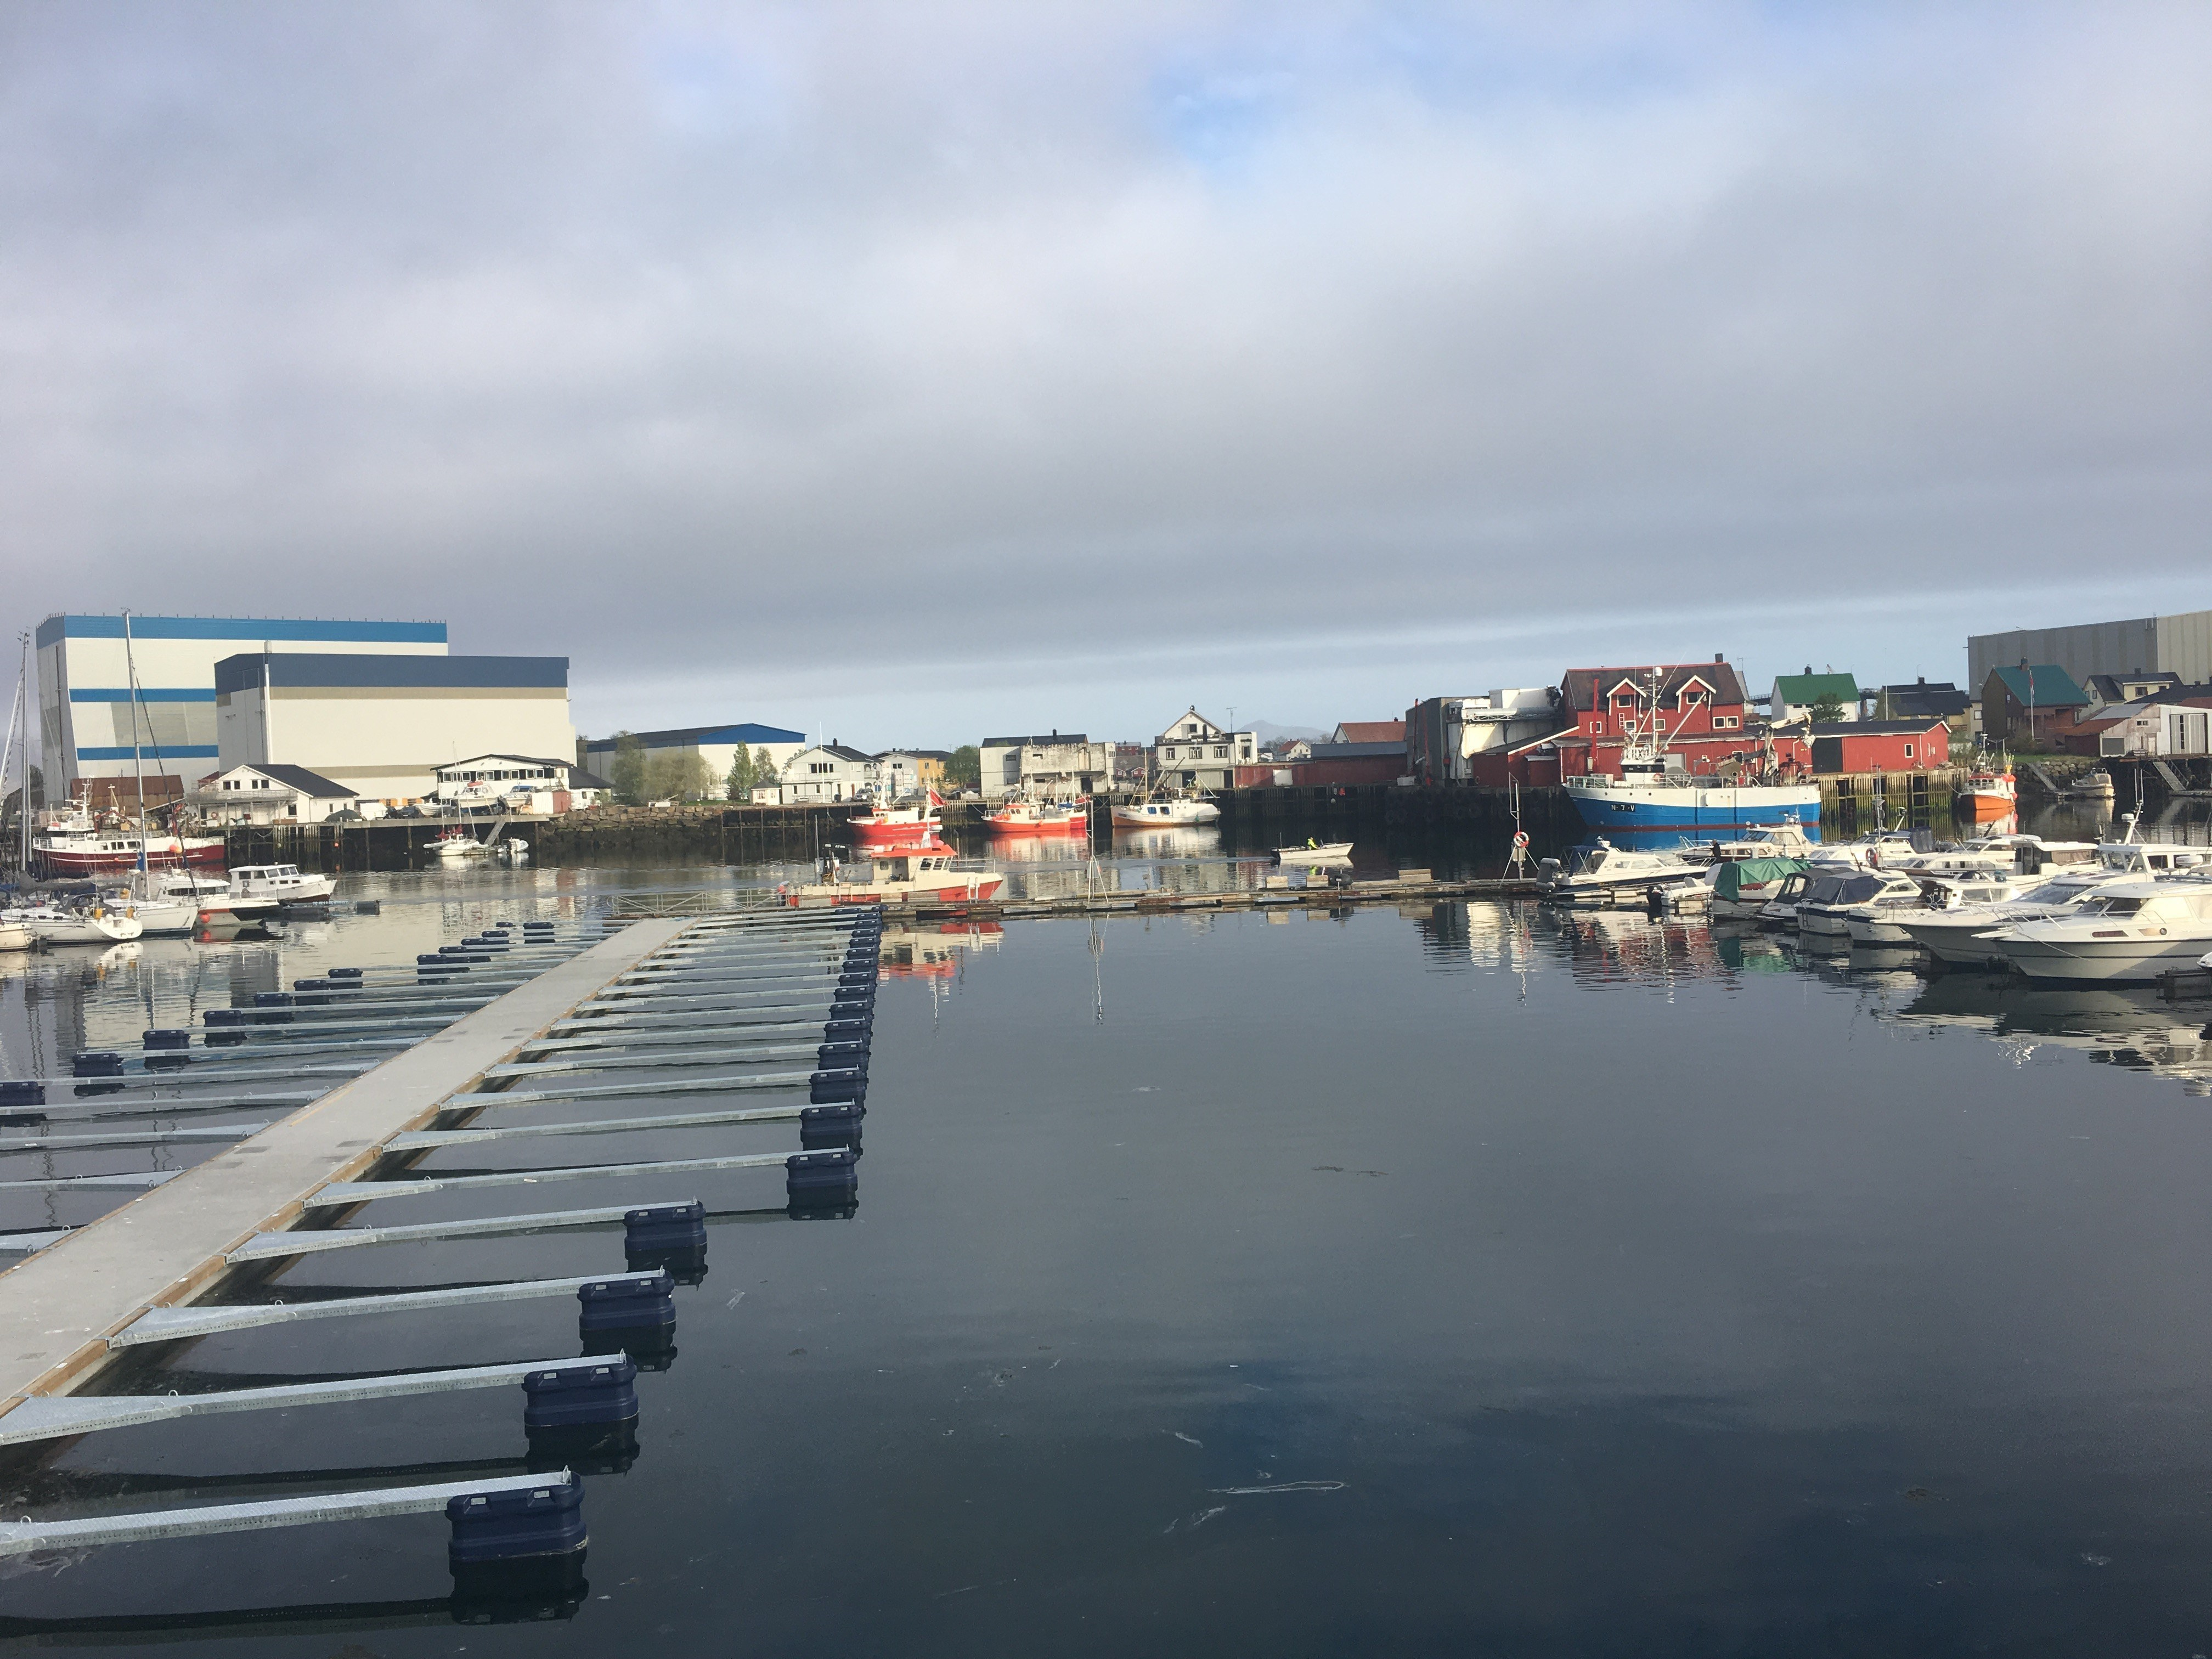 https://marinasolutions.no/uploads/vågan-sjø-og-fiske-4.jpg